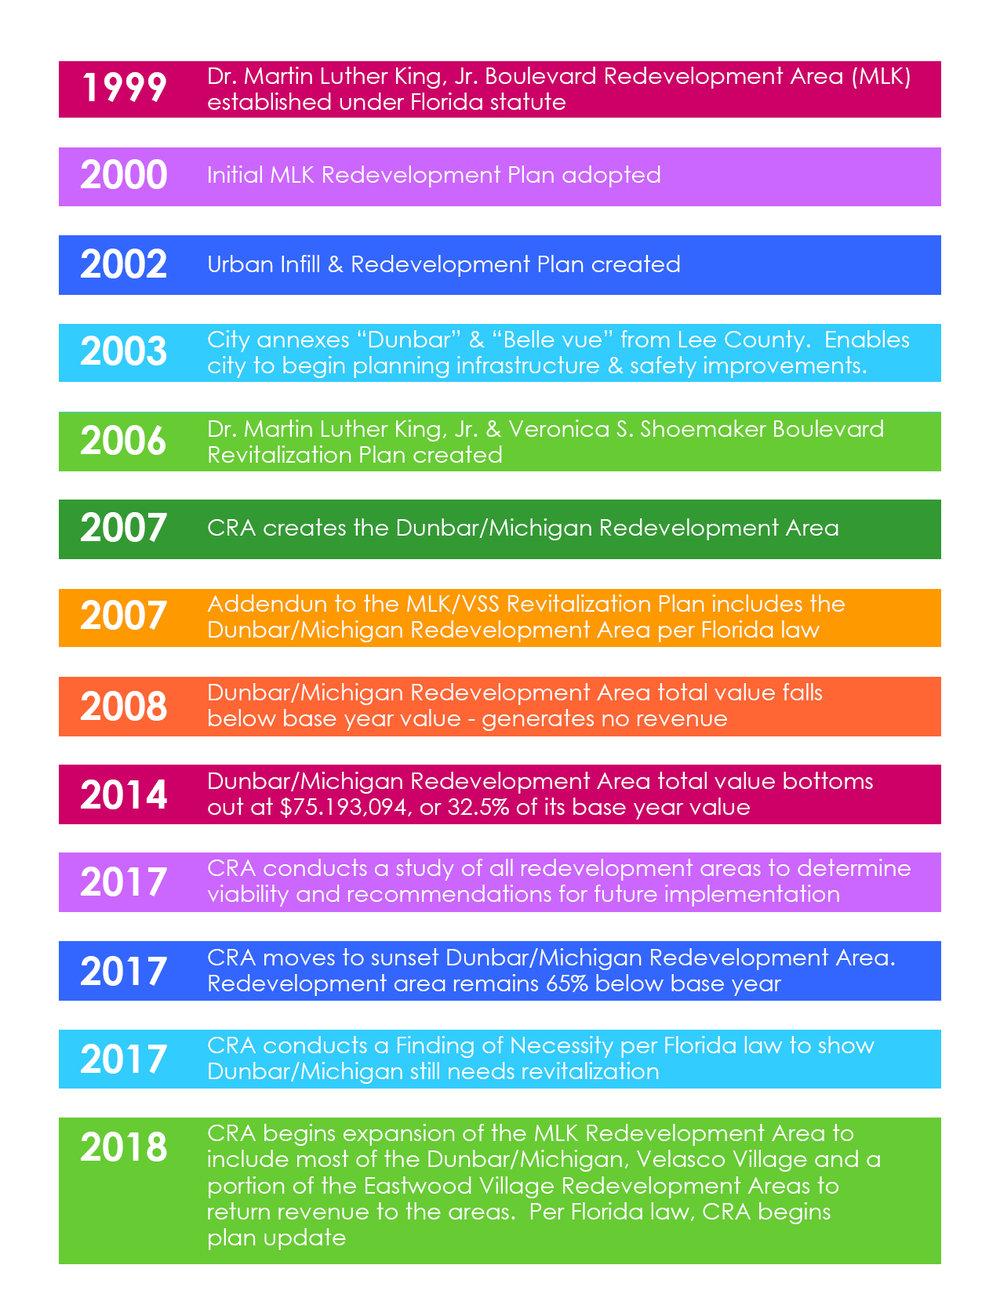 timeline-revised-2.jpg